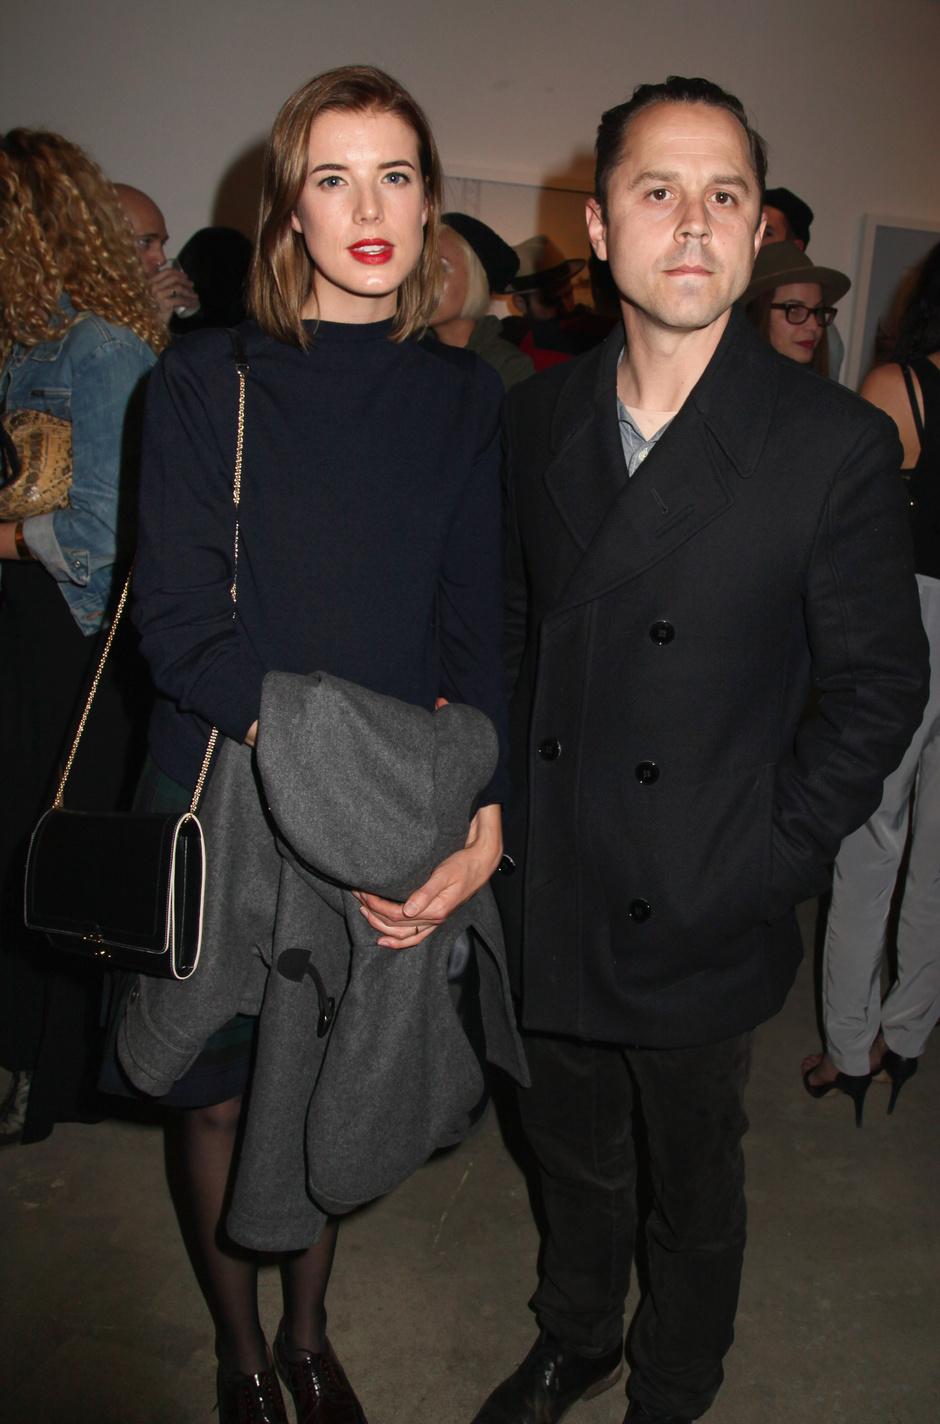 Агнесс Дейн с бывшим мужем Джованни Рибизи